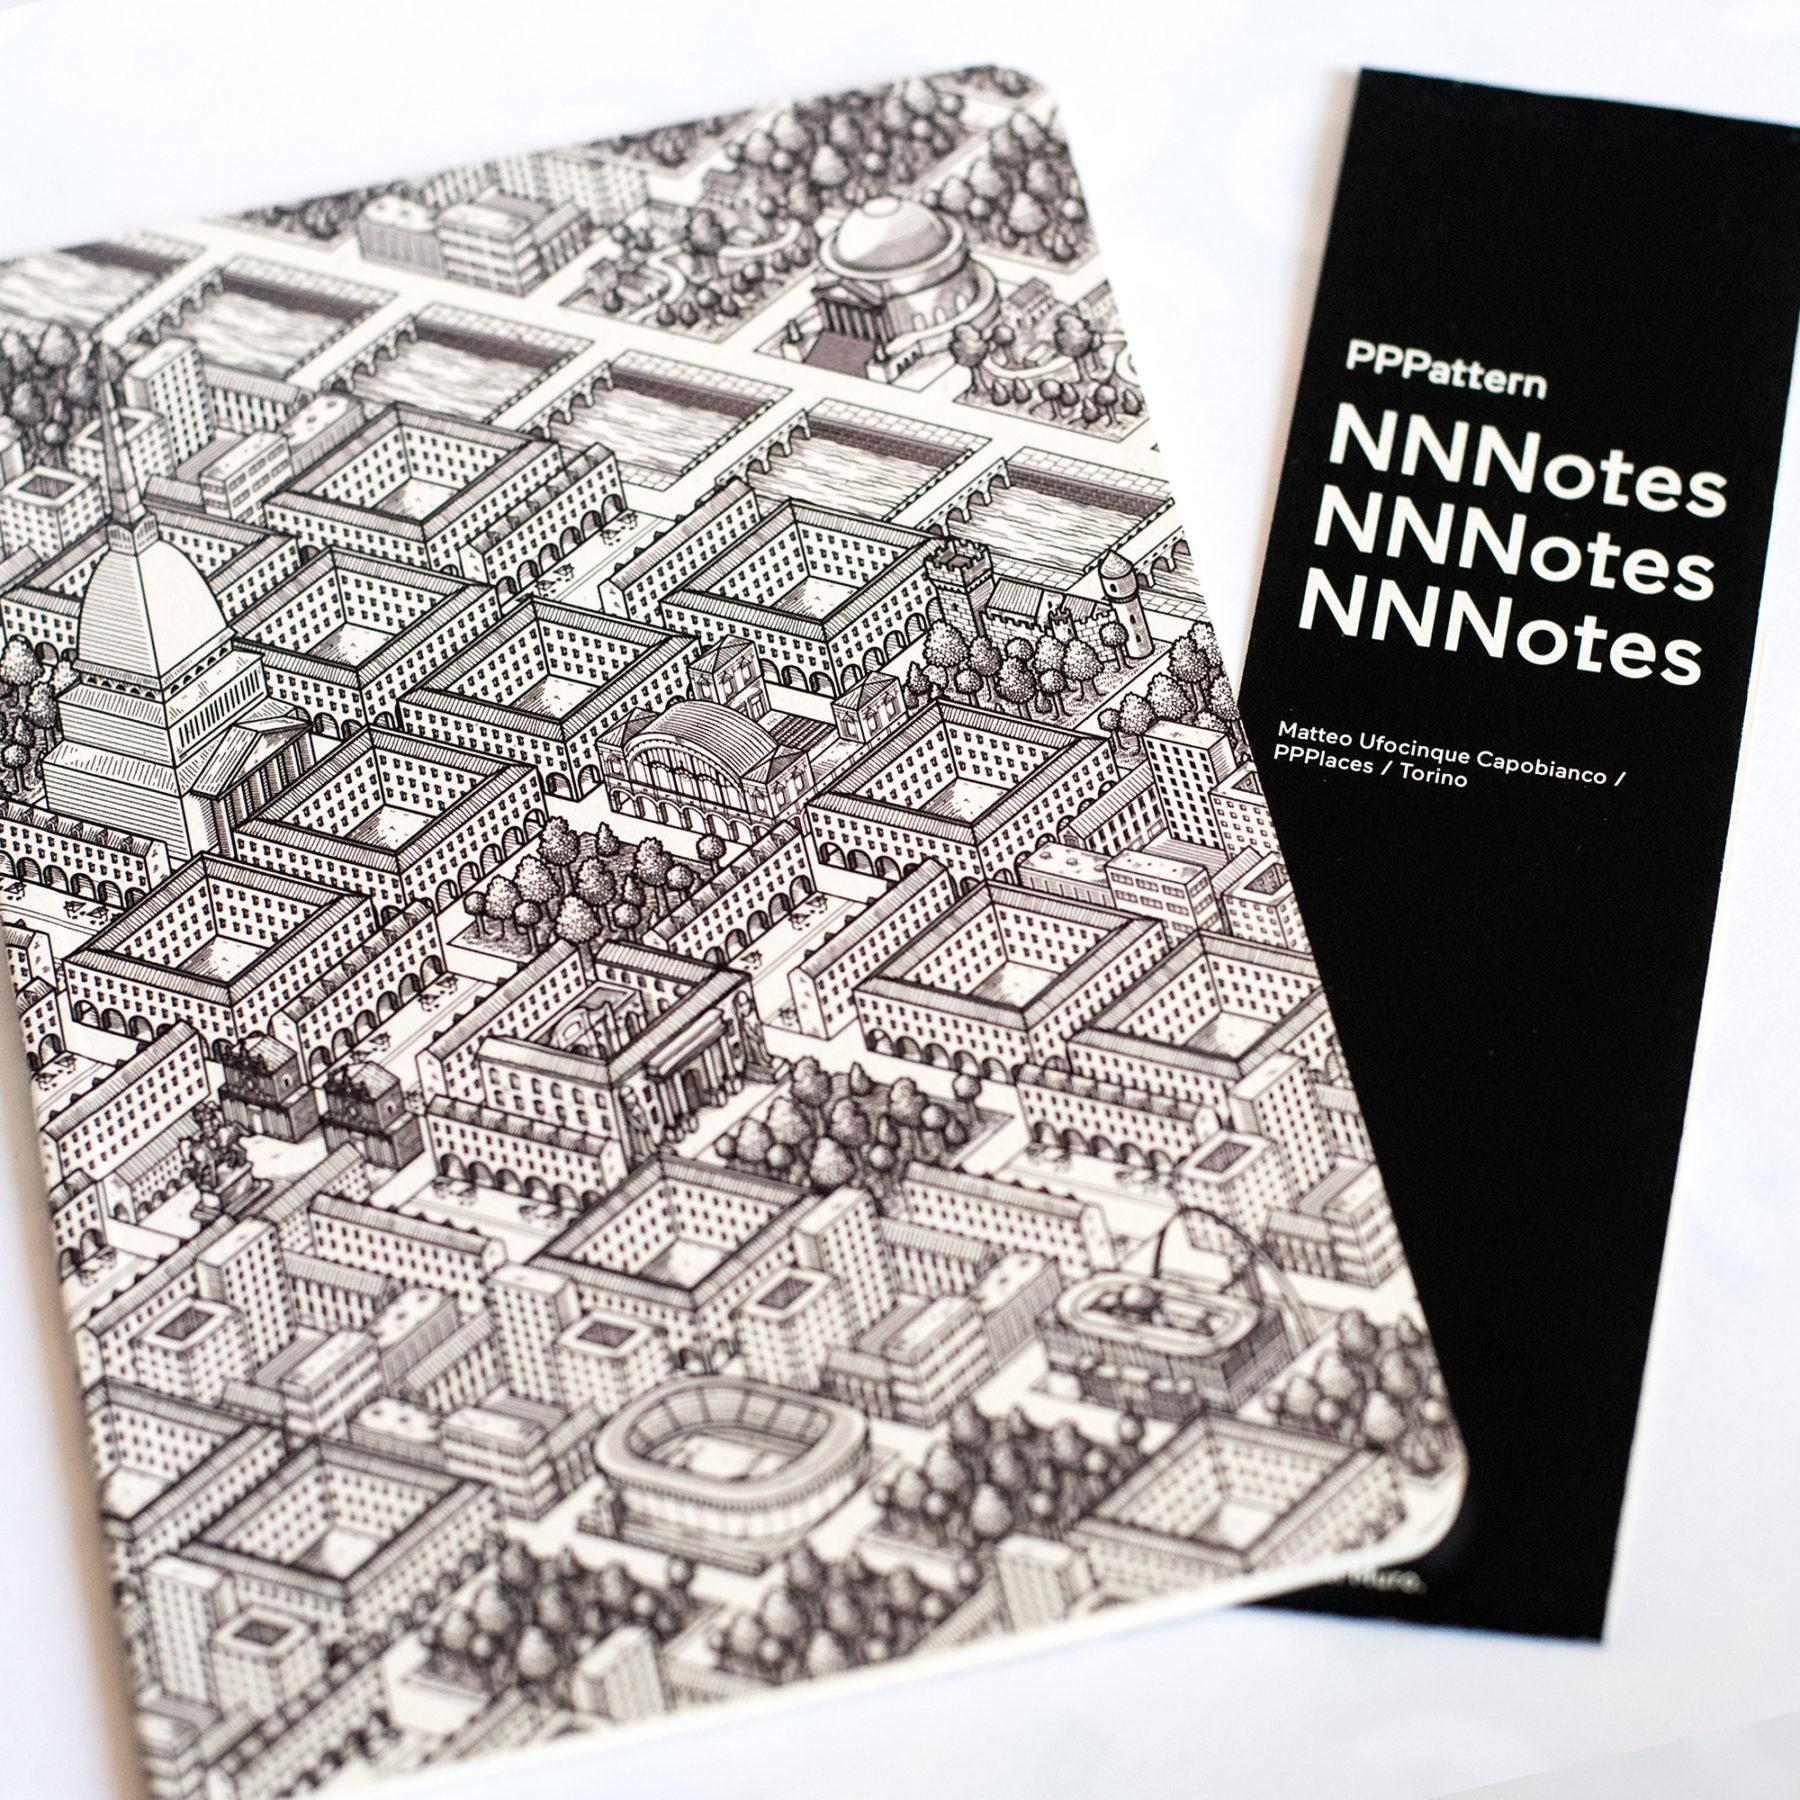 nnnotes 11